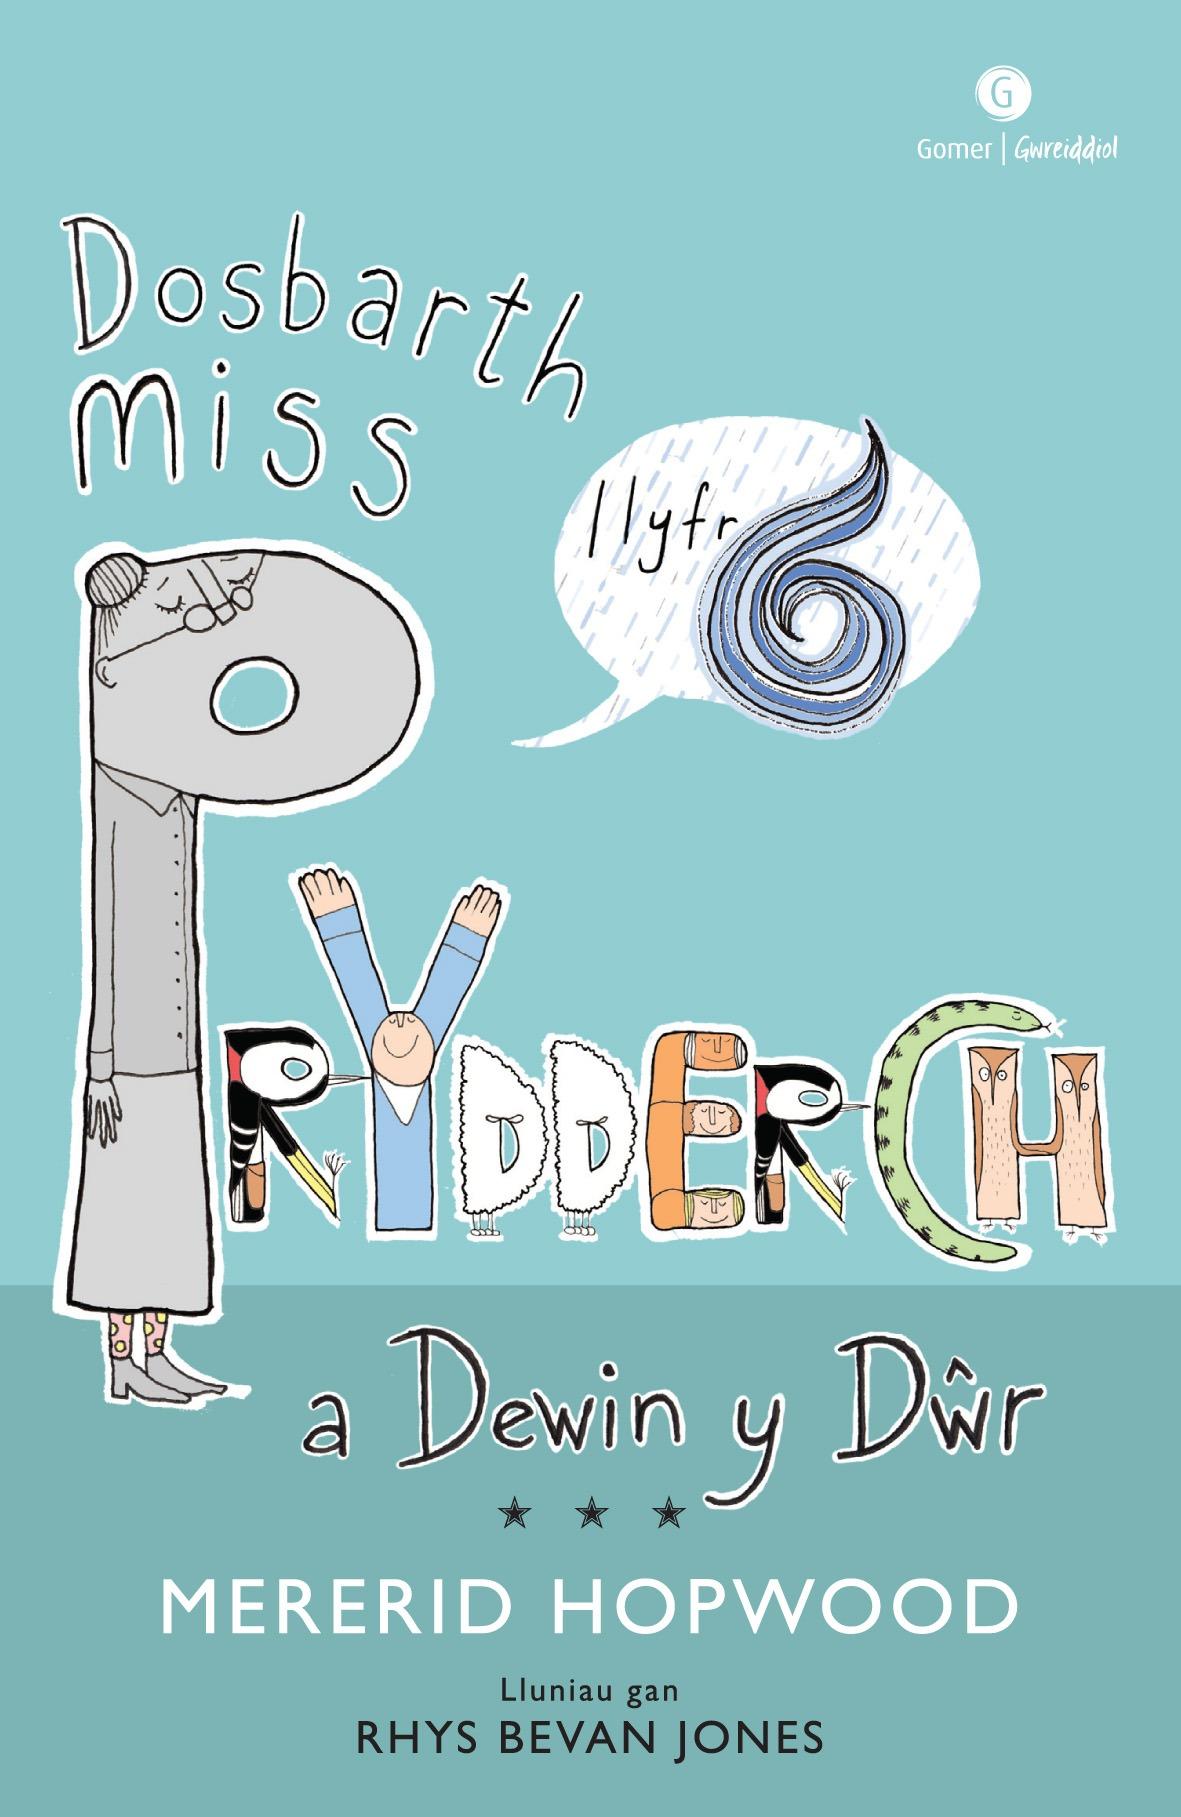 Mererid Hopwood Dosbarth Miss Prydderch 6